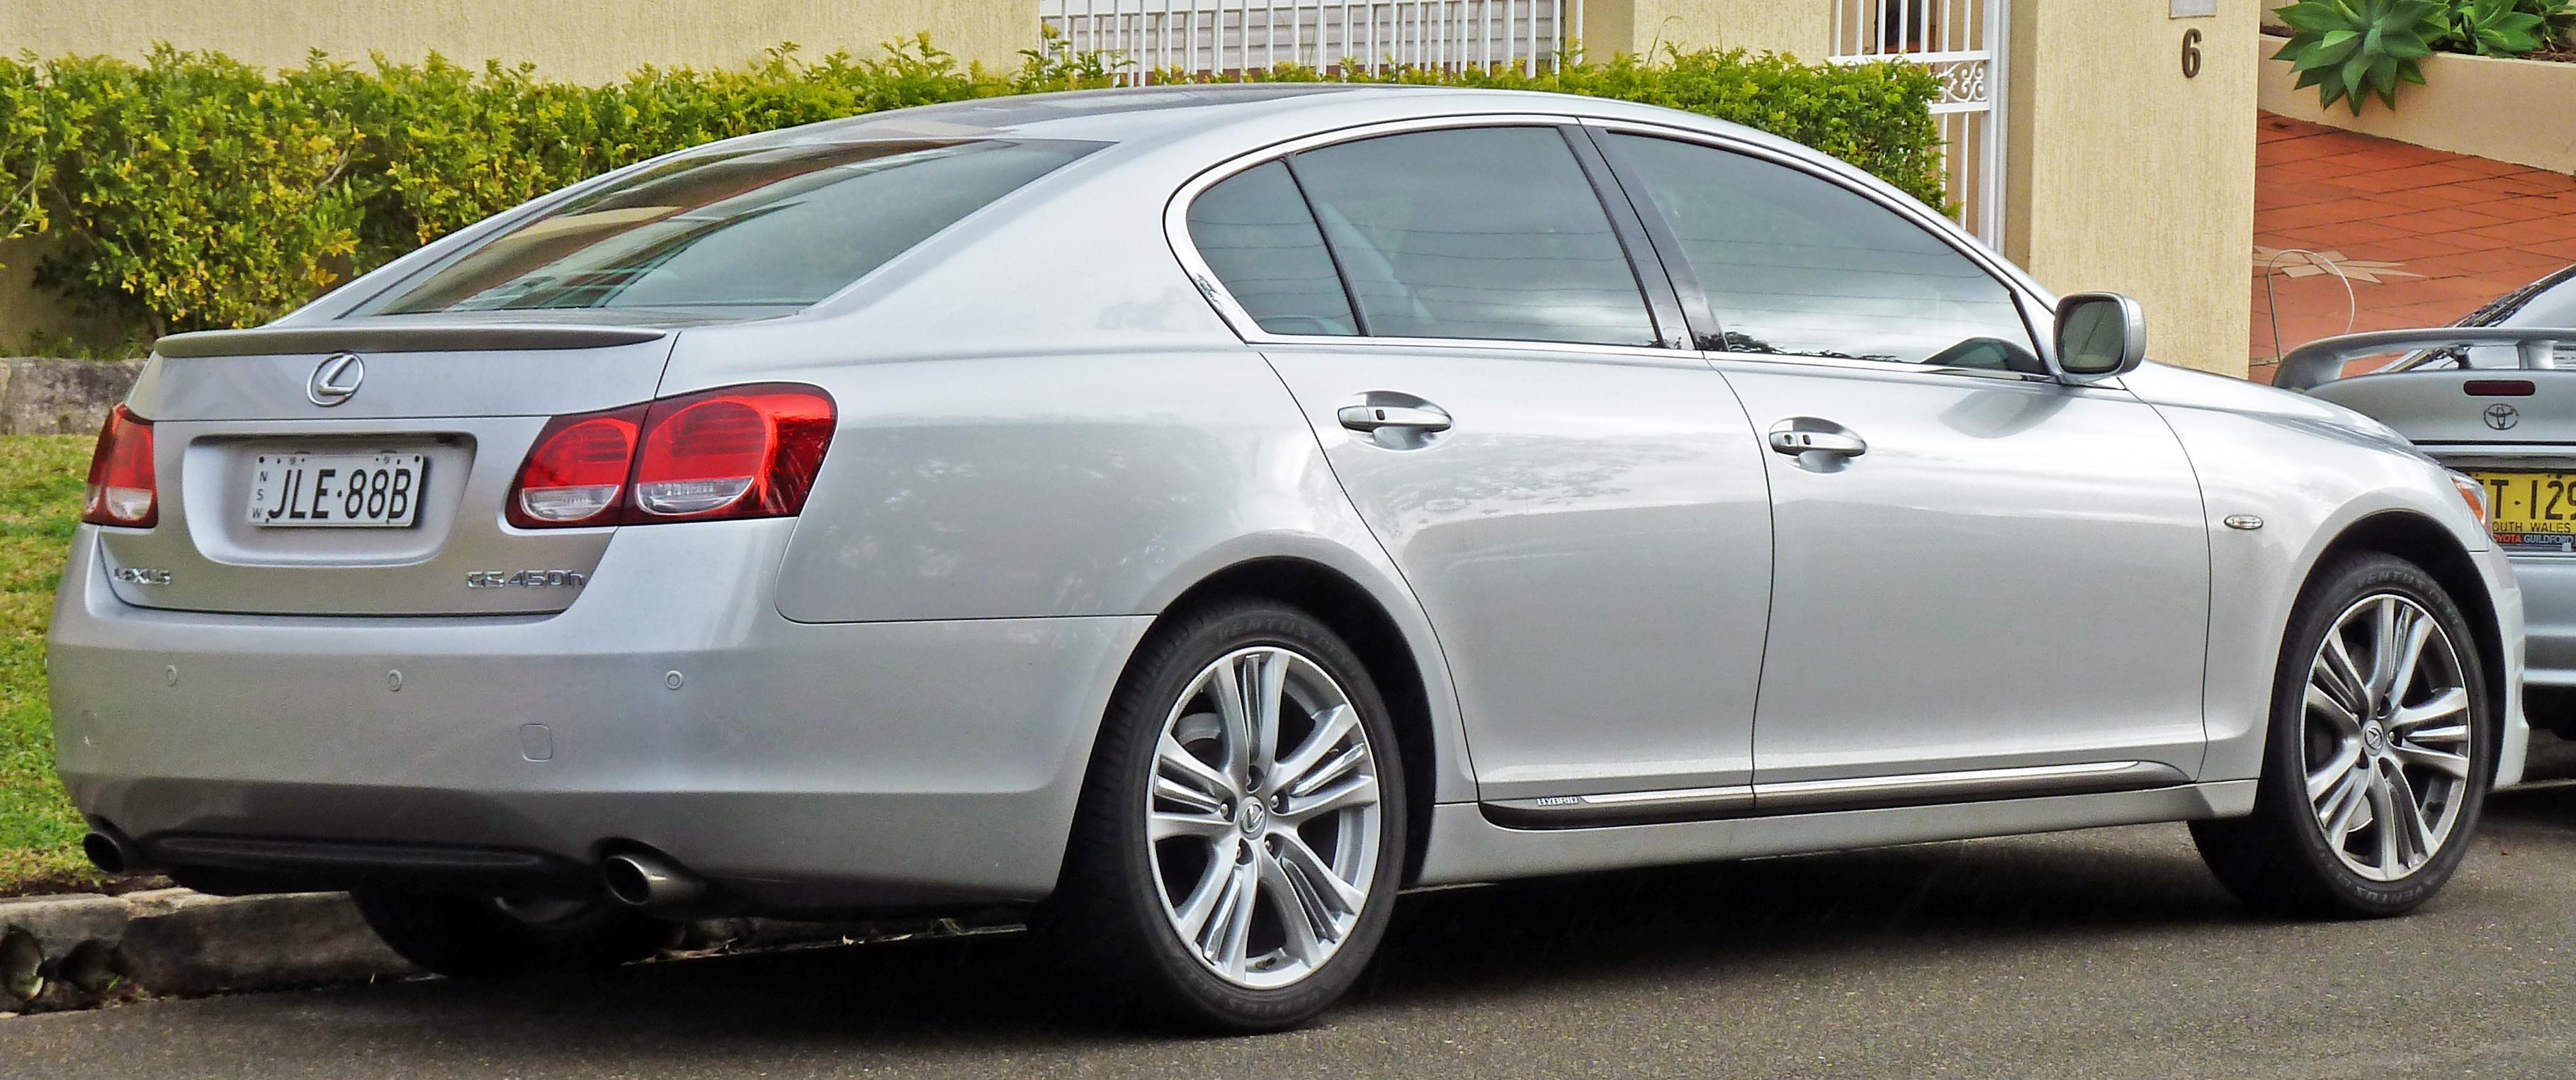 https://upload.wikimedia.org/wikipedia/commons/5/52/2006-2009_Lexus_GS_450h_%28GWS191R%29_sedan_02.jpg